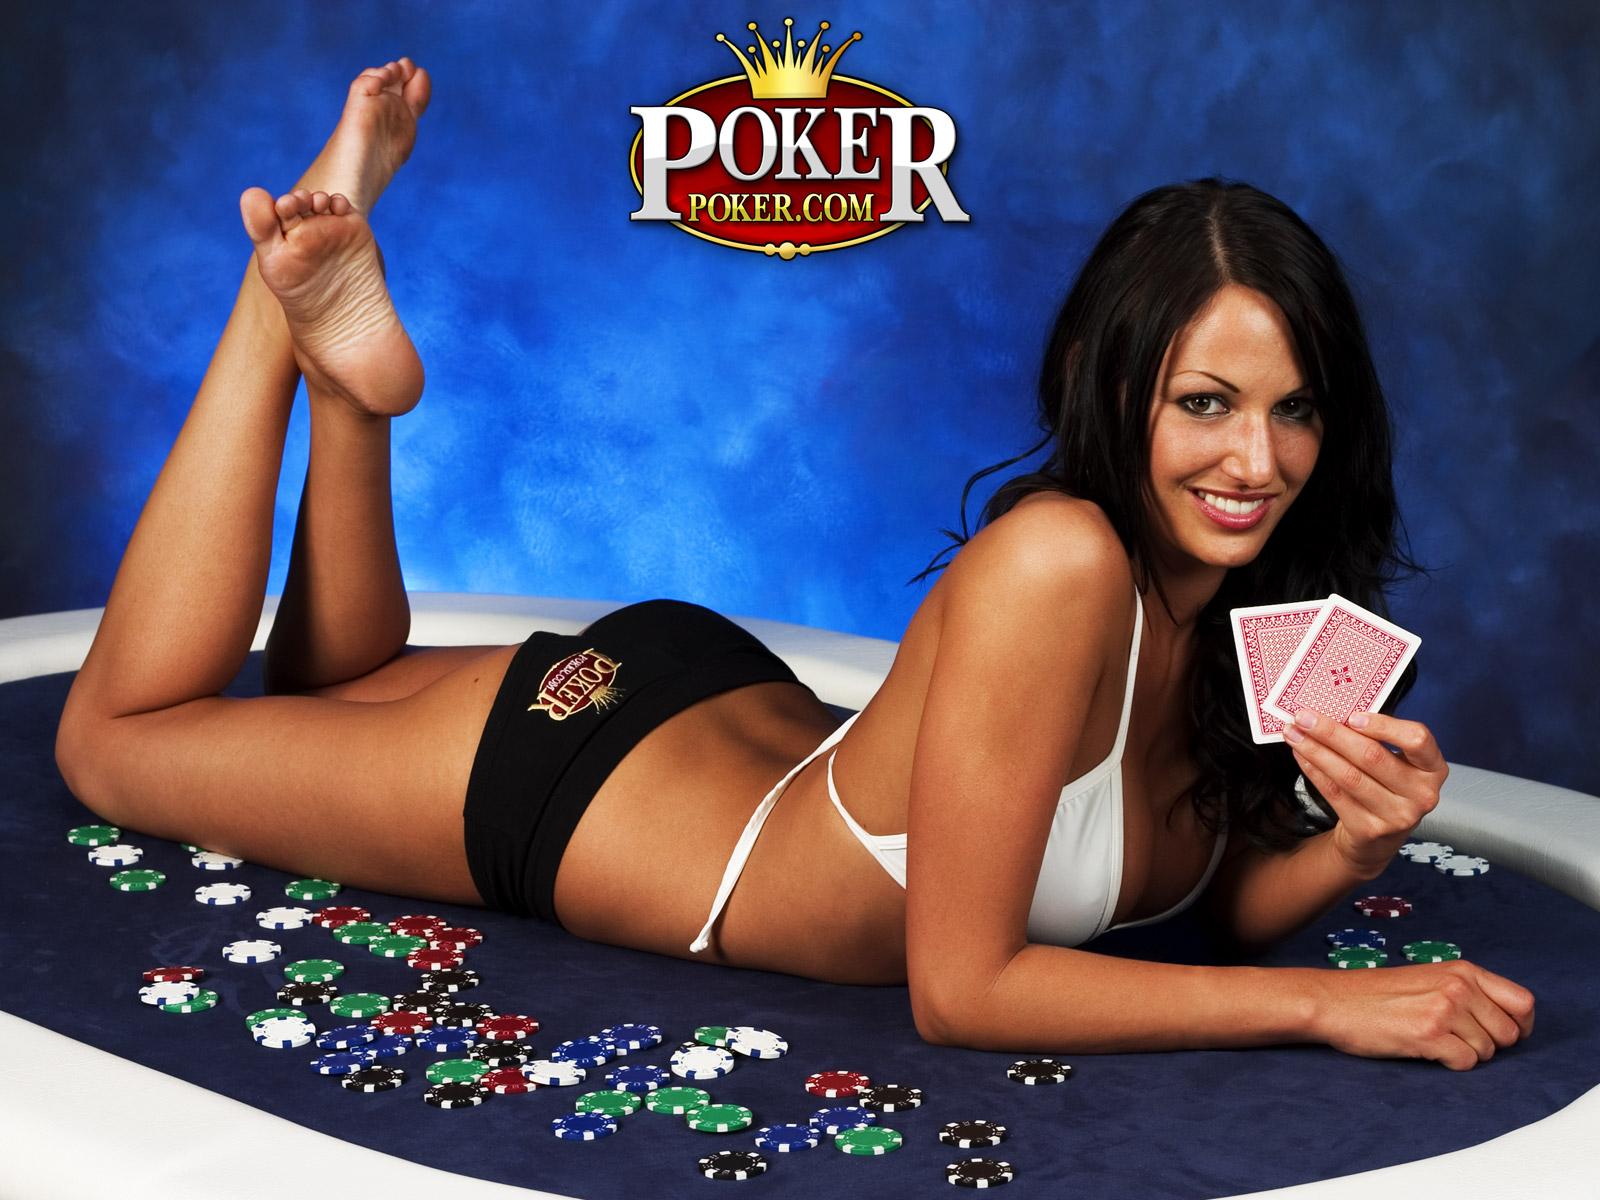 Poker Online - poker download